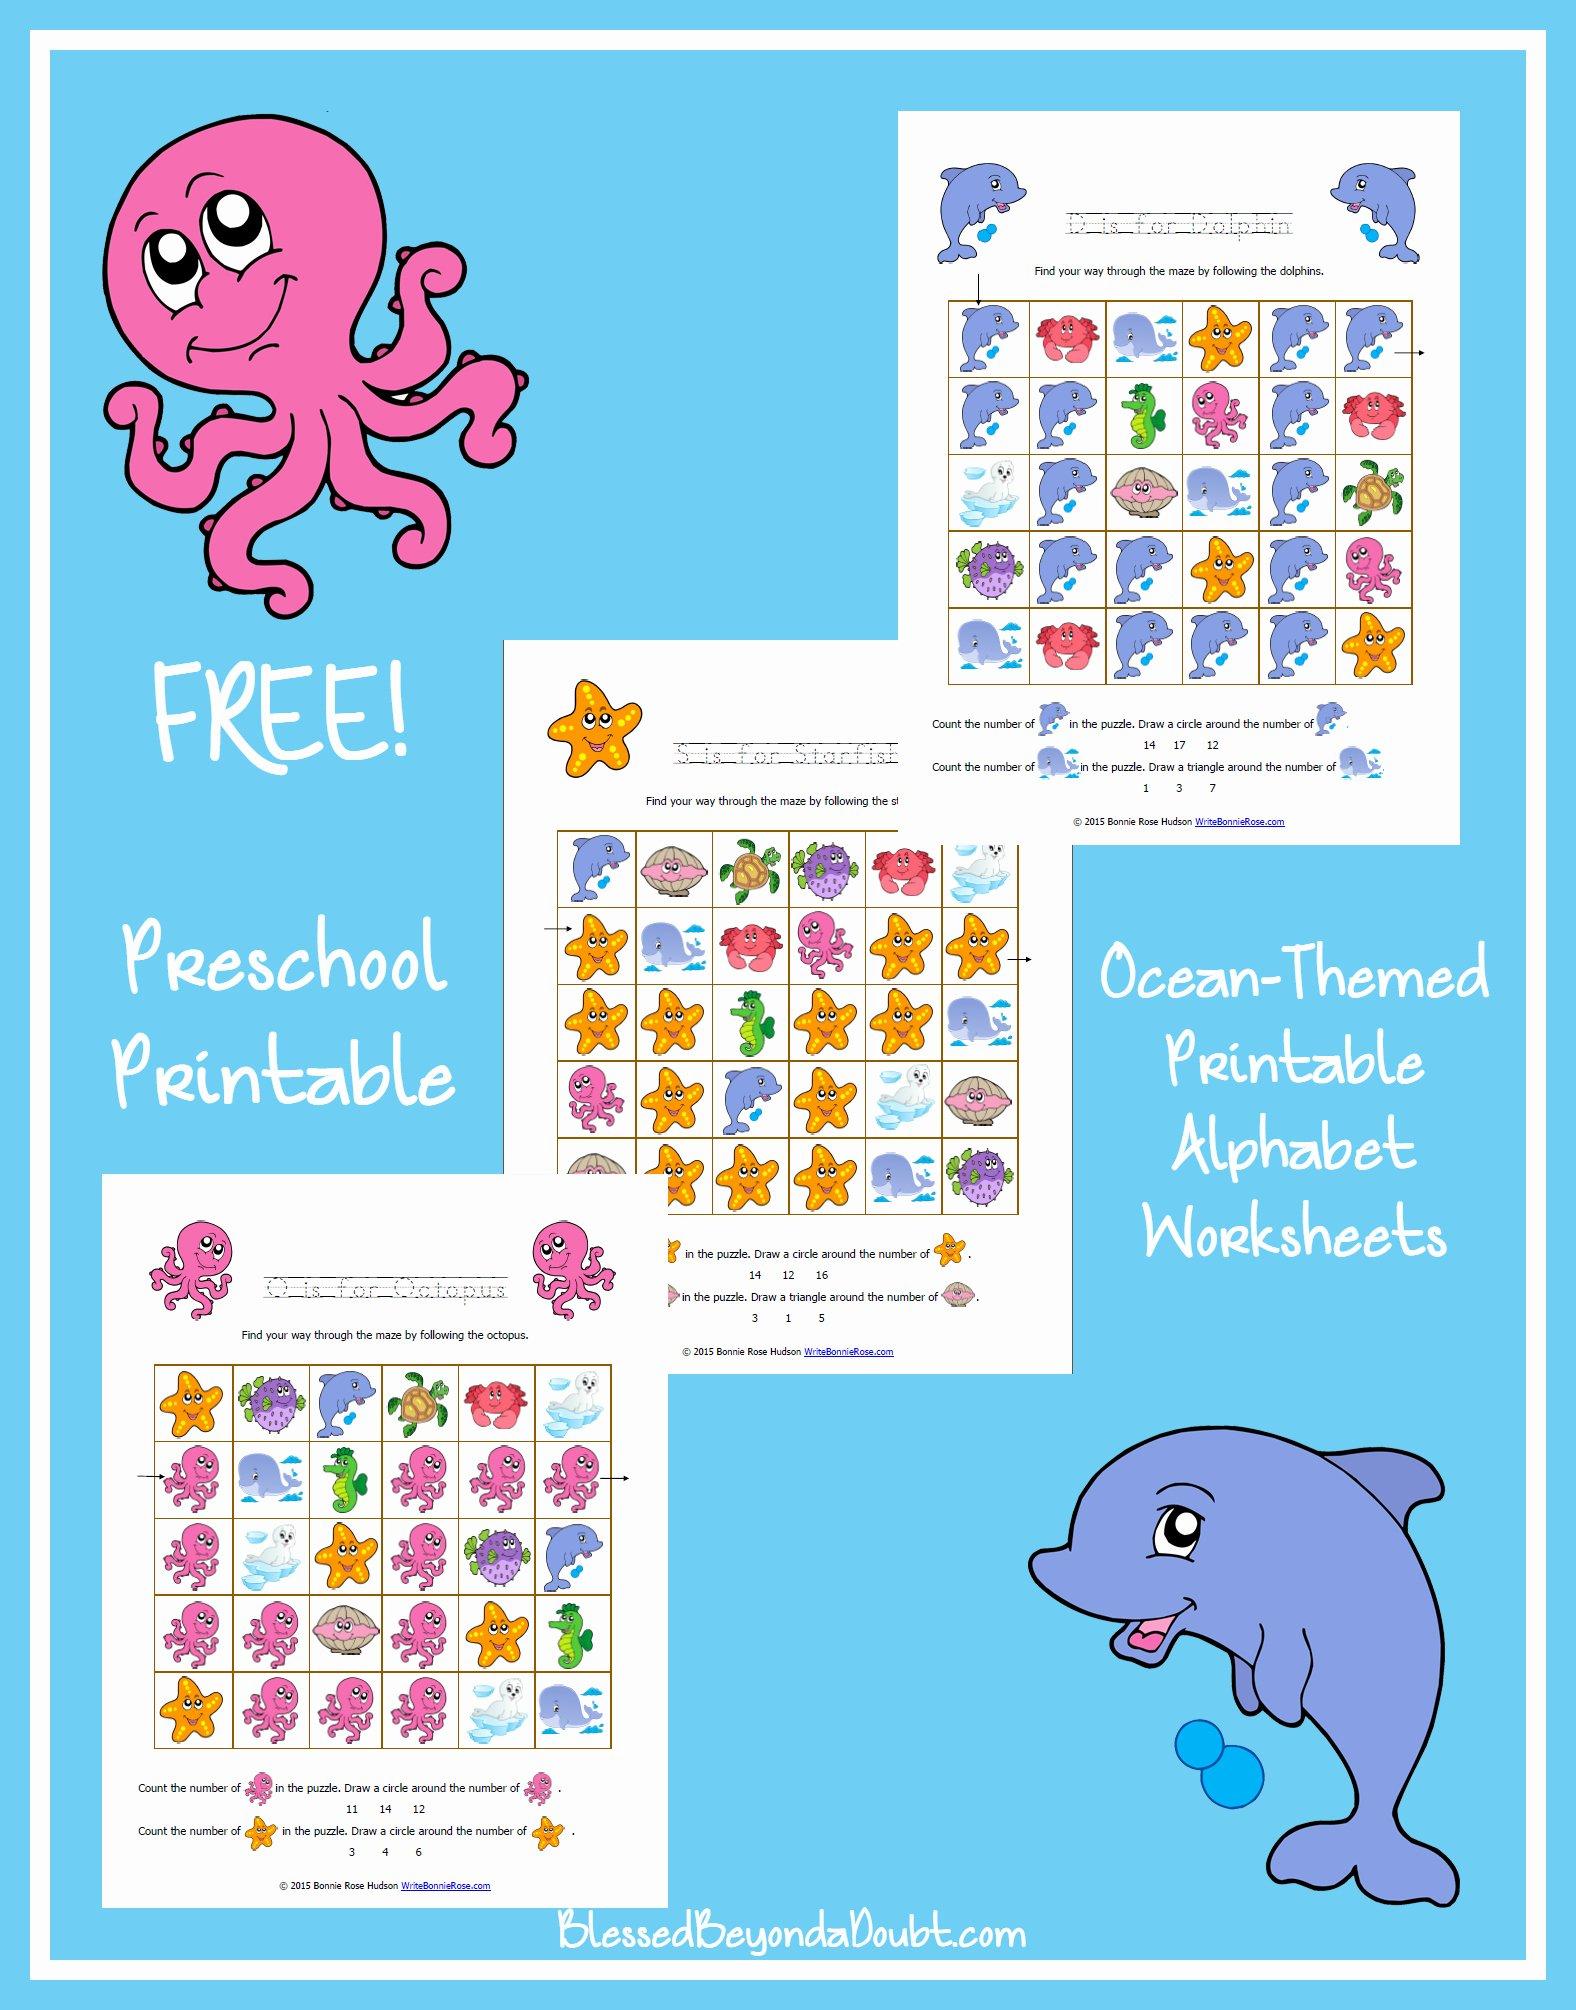 Ocean themed Worksheets for Preschoolers top Free Ocean themed Printable Alphabet Worksheets for